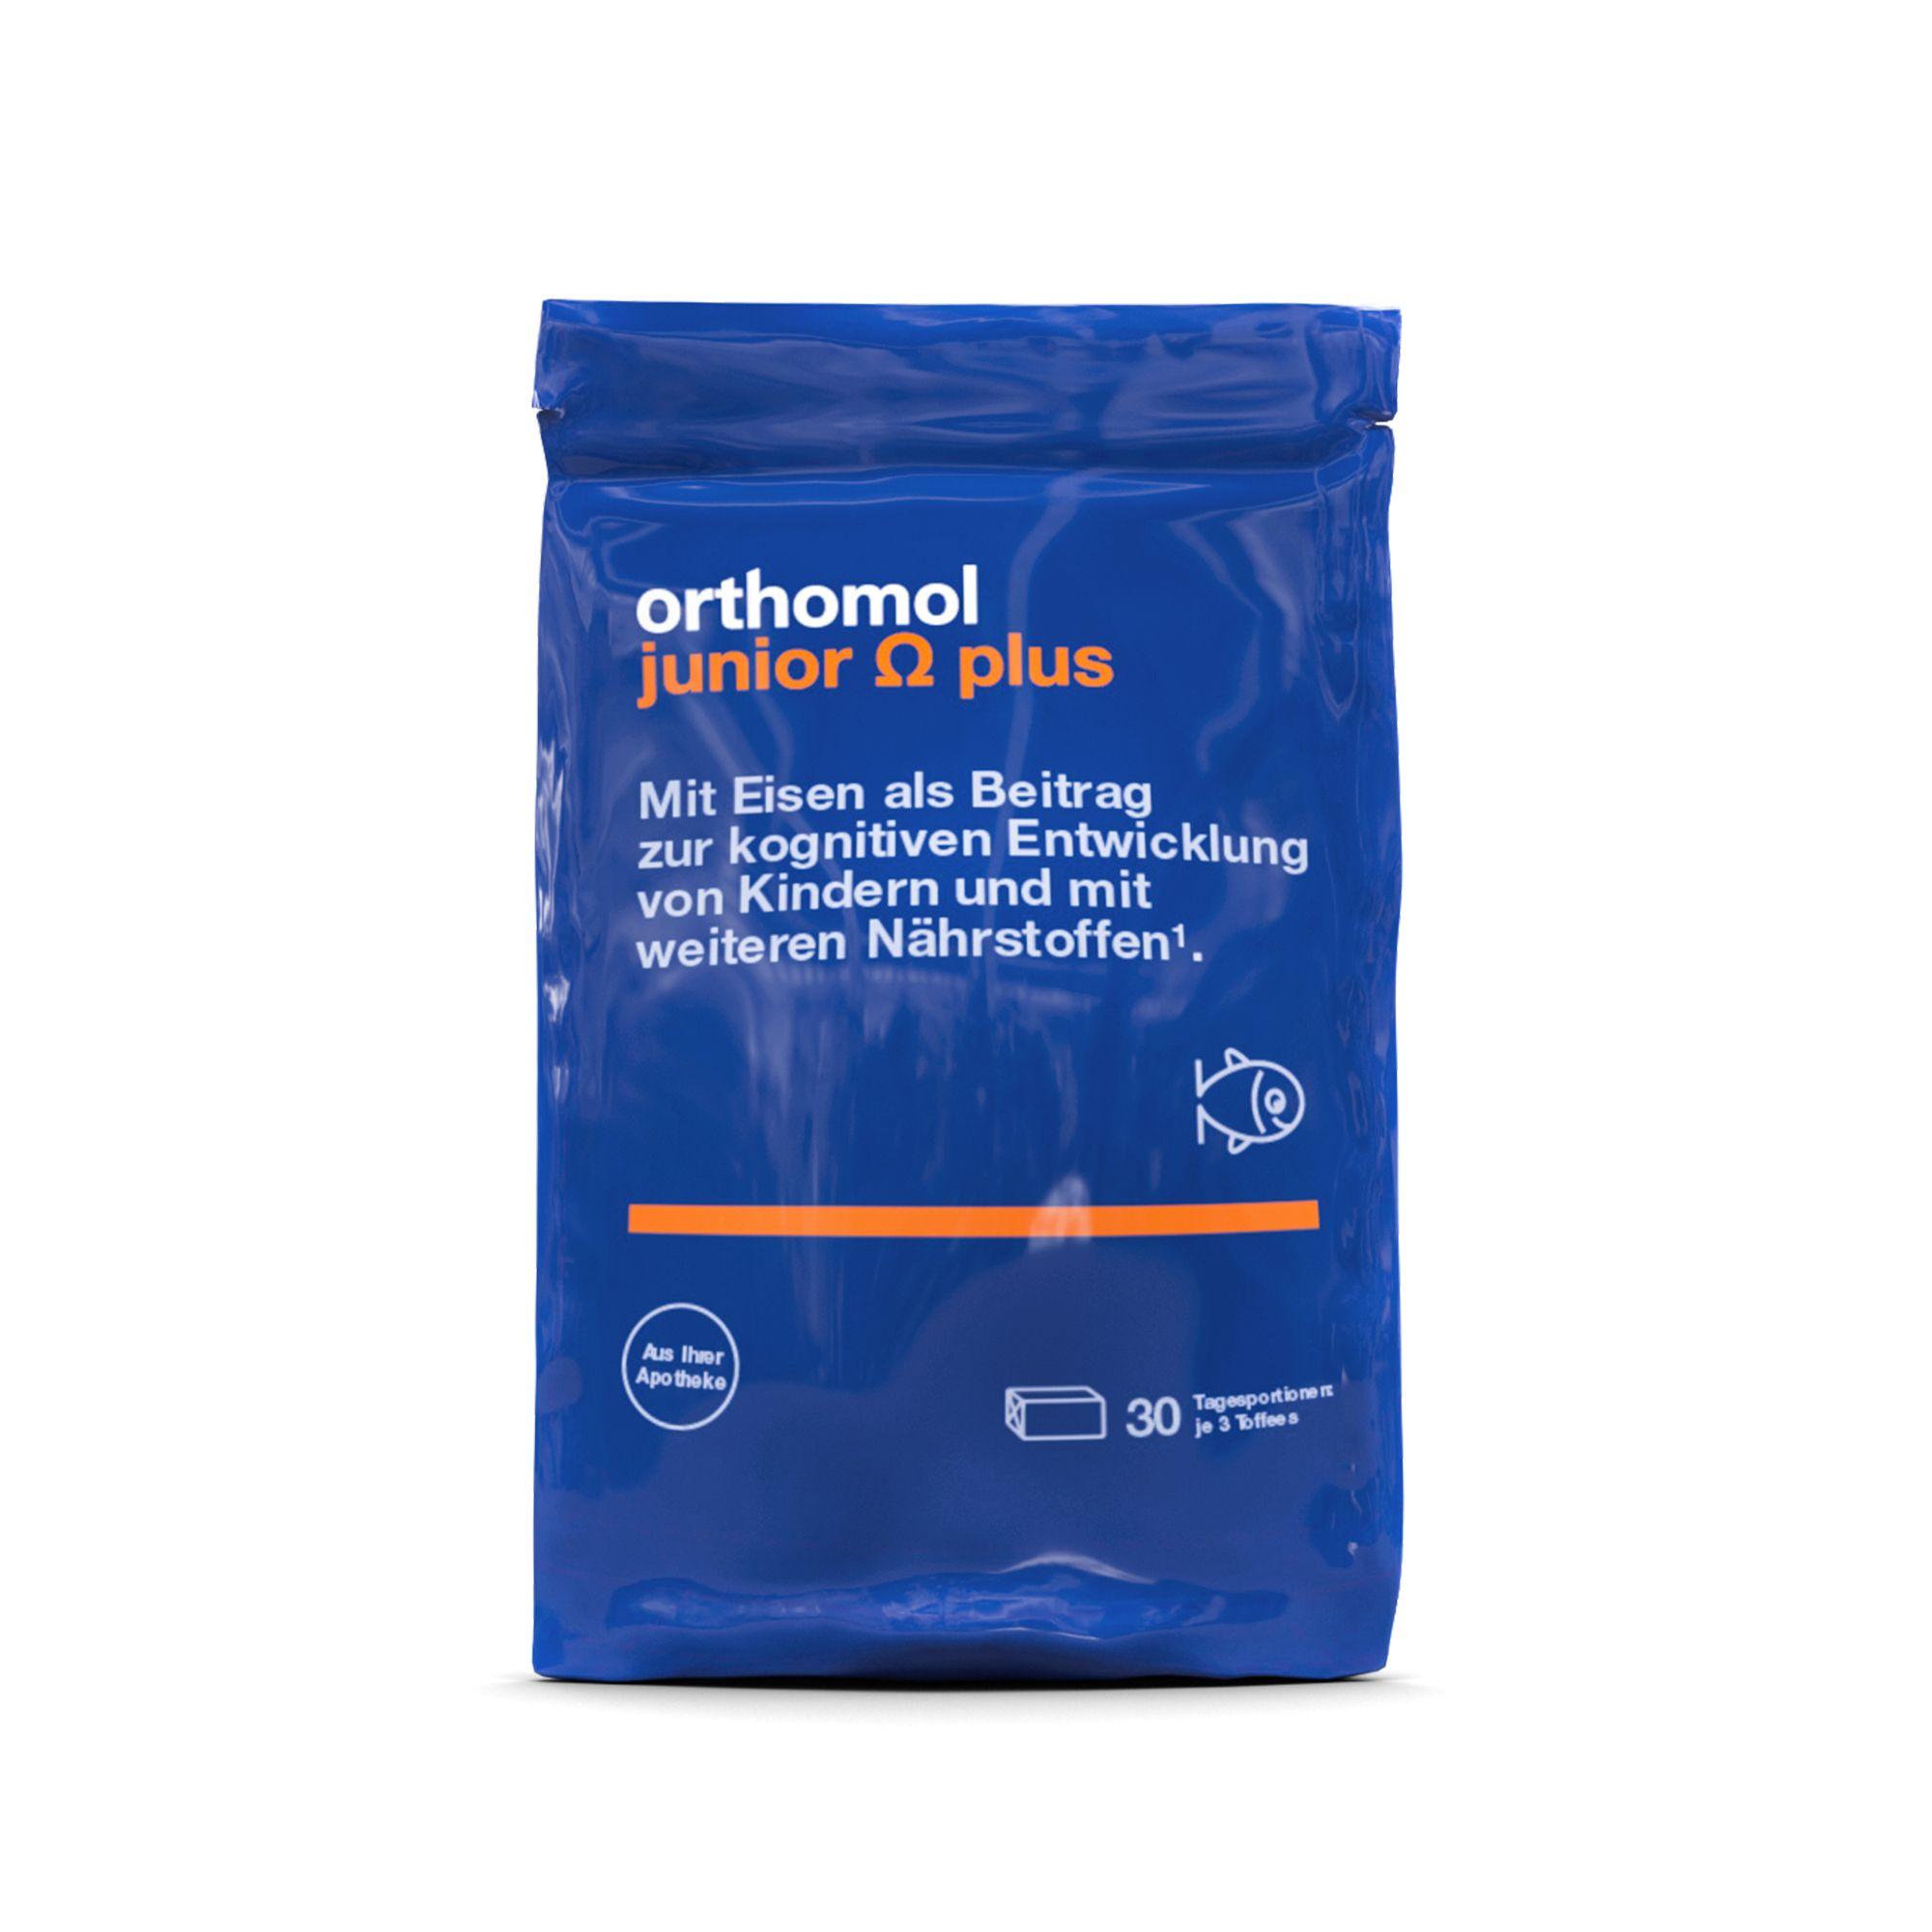 Orthomol Junior Omega Plus Kaudragees 30 St Shop Apotheke Com